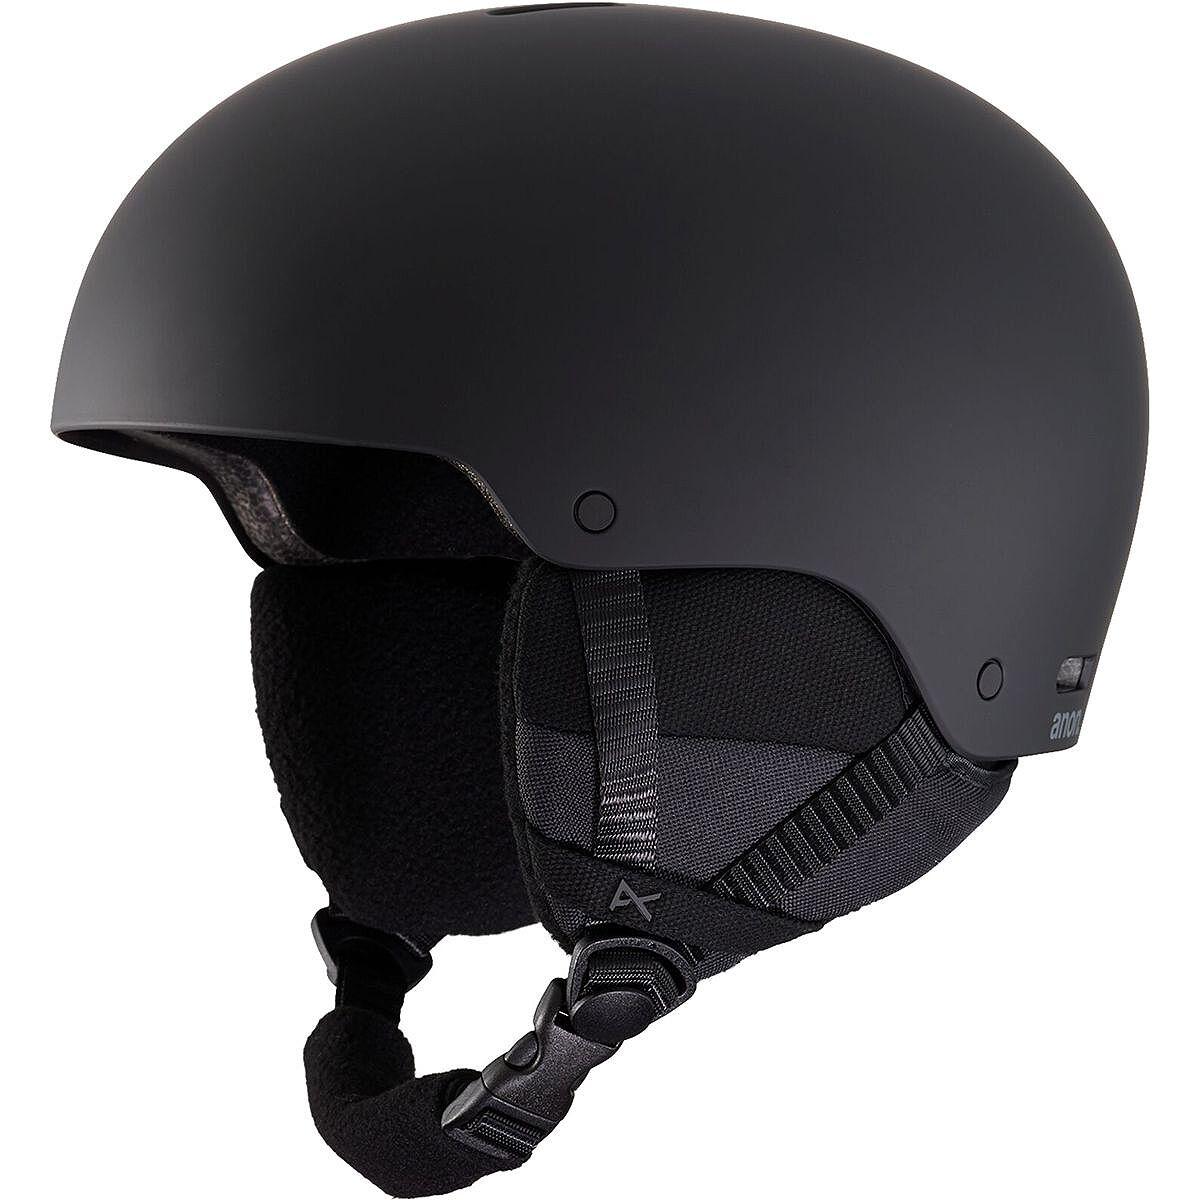 ANON Skihelm Snowboardhelm RAIDER Helm 2019 black Helmet Sporthelm